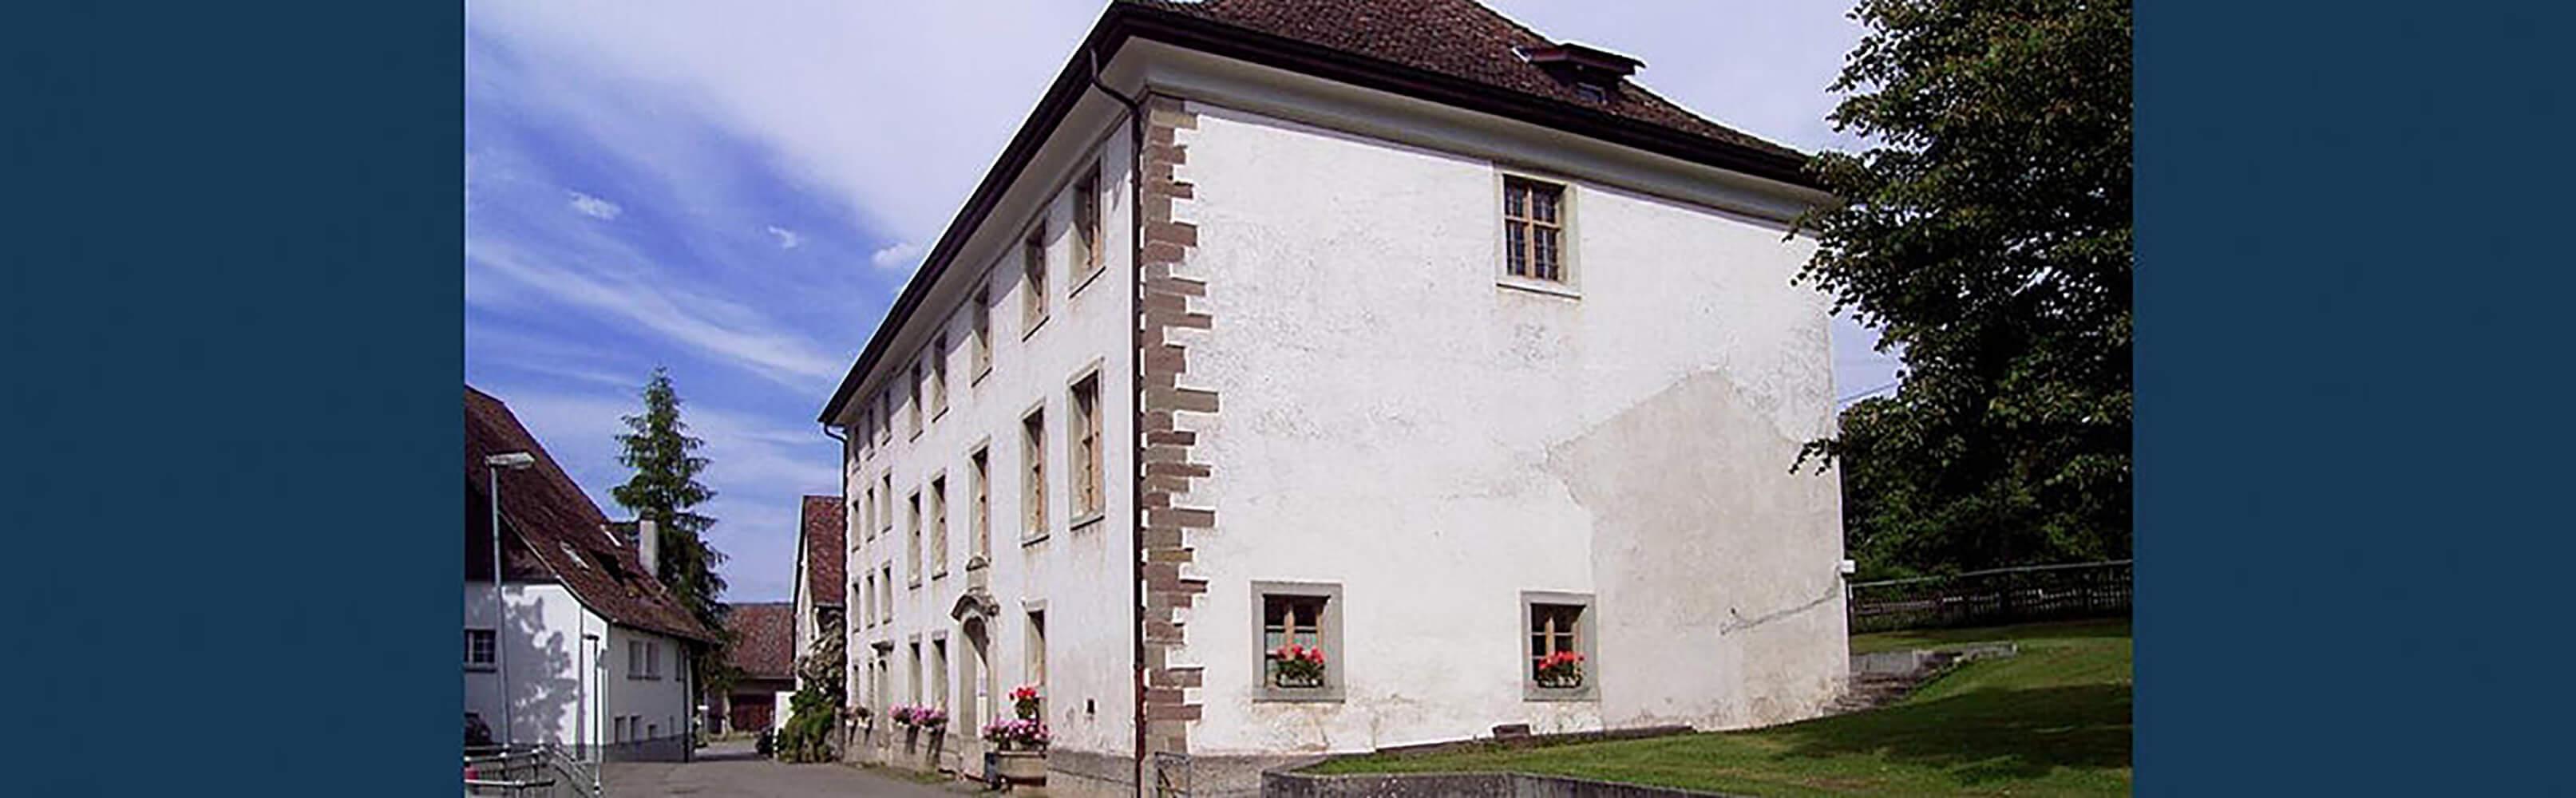 Museum Schleitheimertal 1